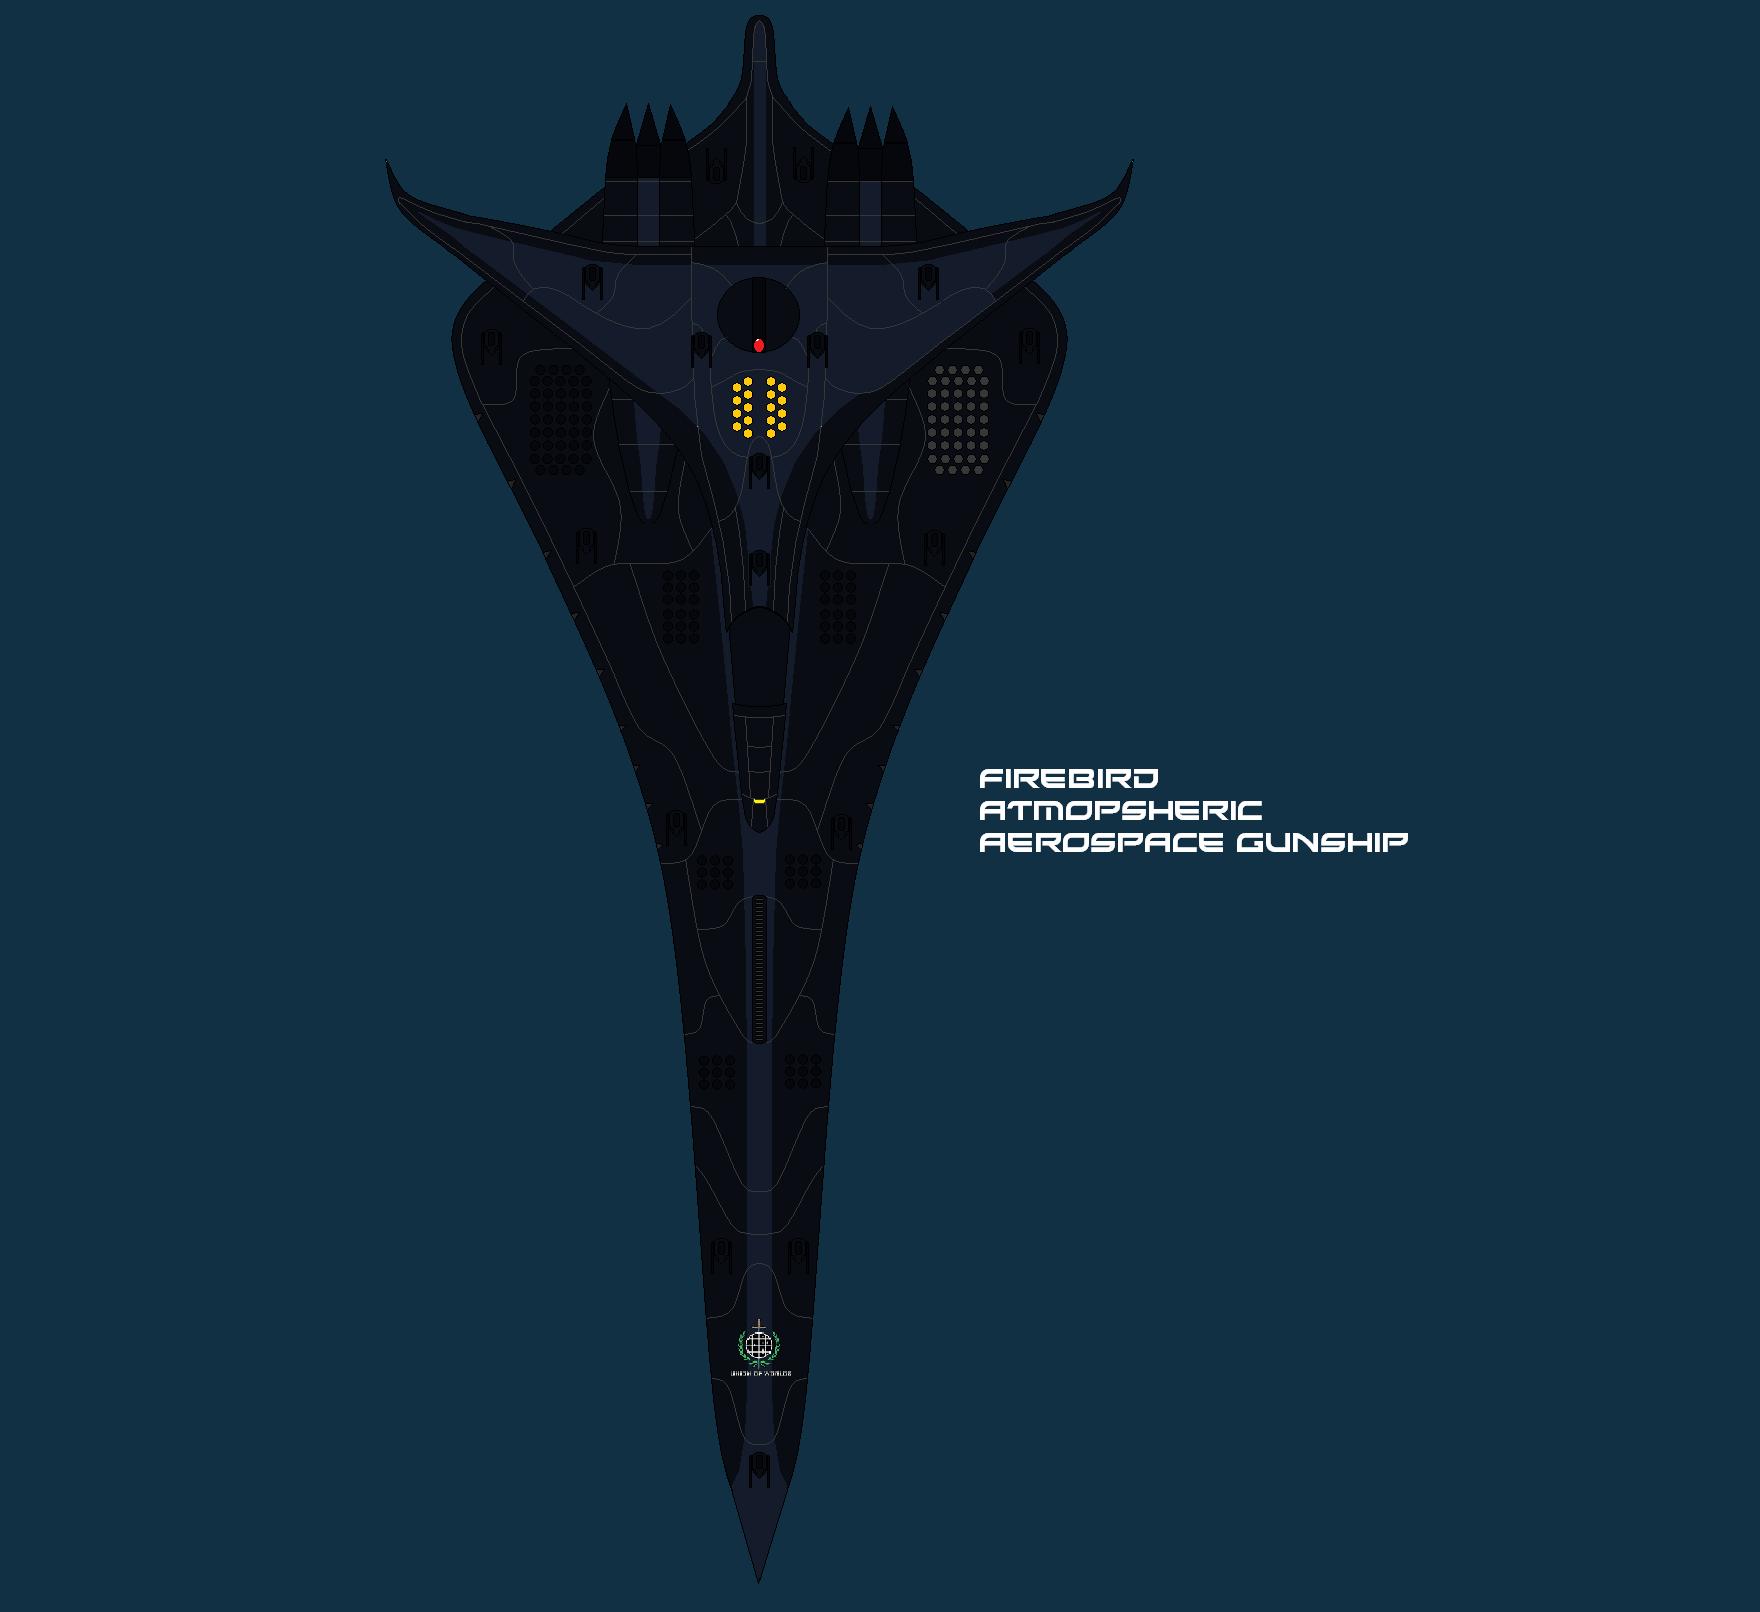 Fire Bird Orbital Defense Aerospace Gunship by EmperorMyric